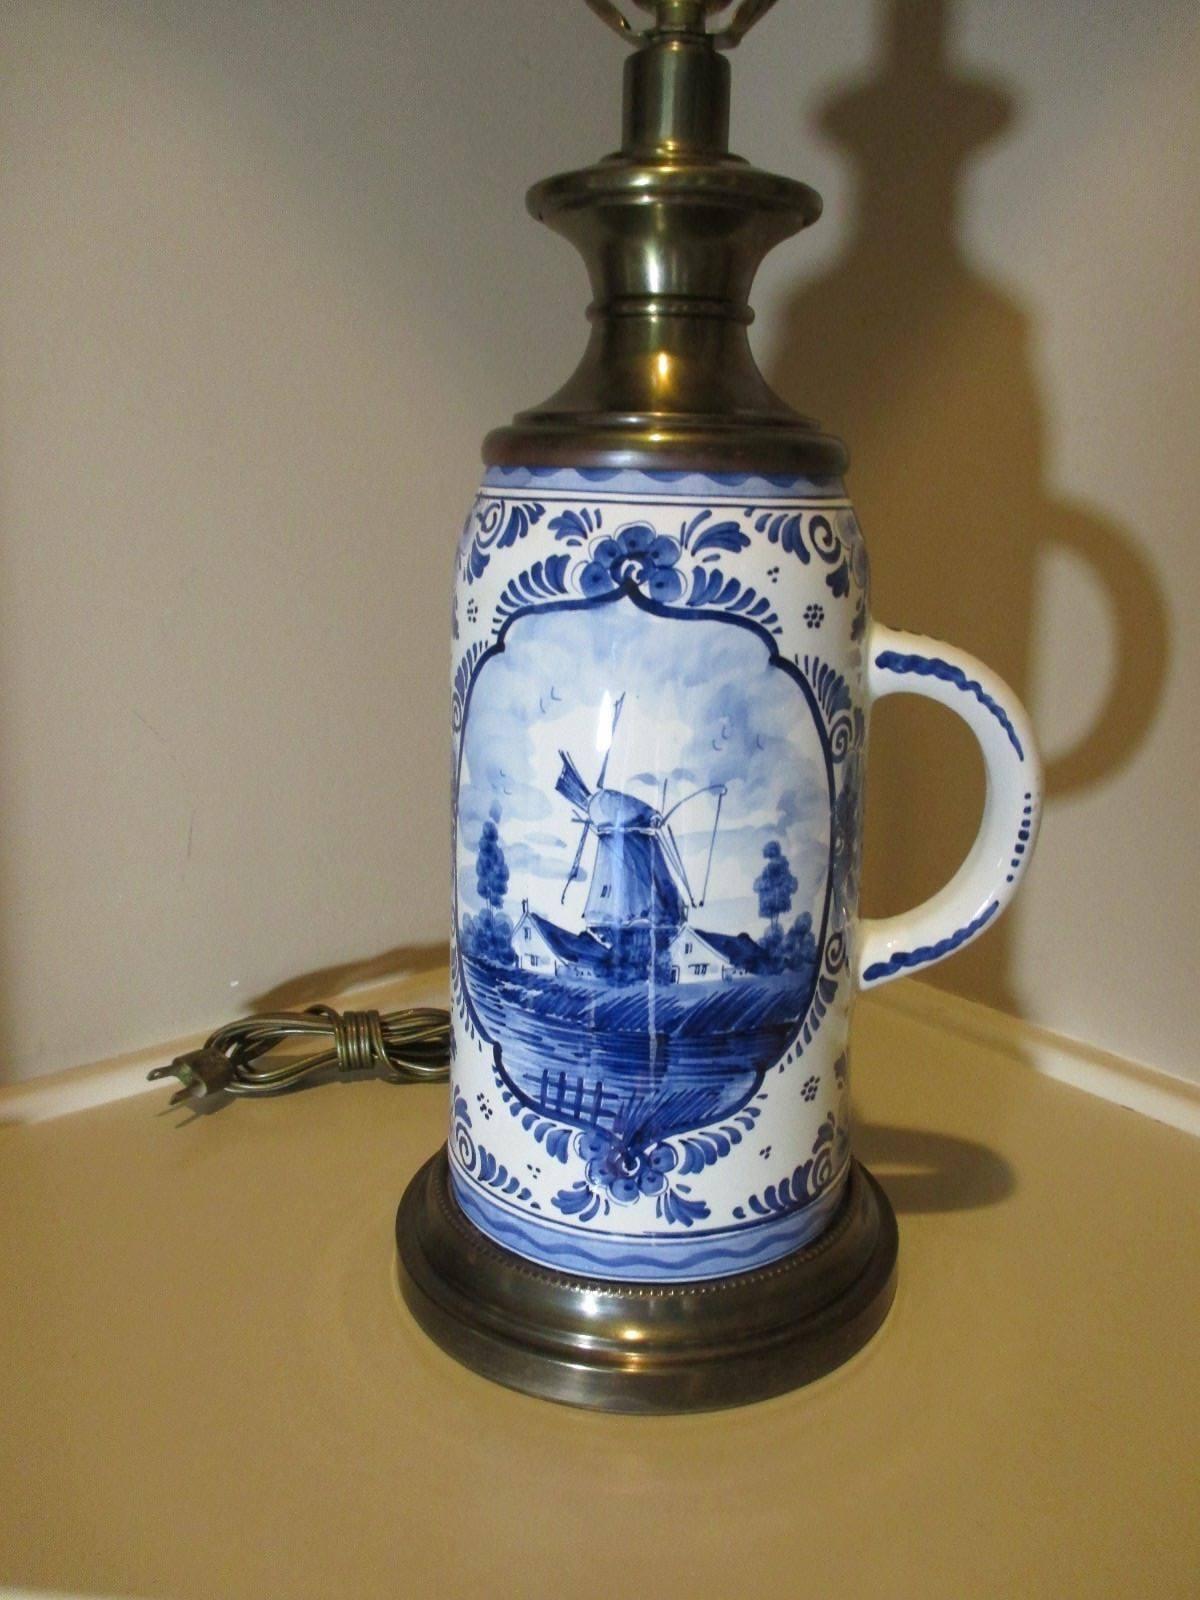 Blau Delf Lamp 3 way Electric Stein Stoneware Windmill Vintage 29 tall  EL24